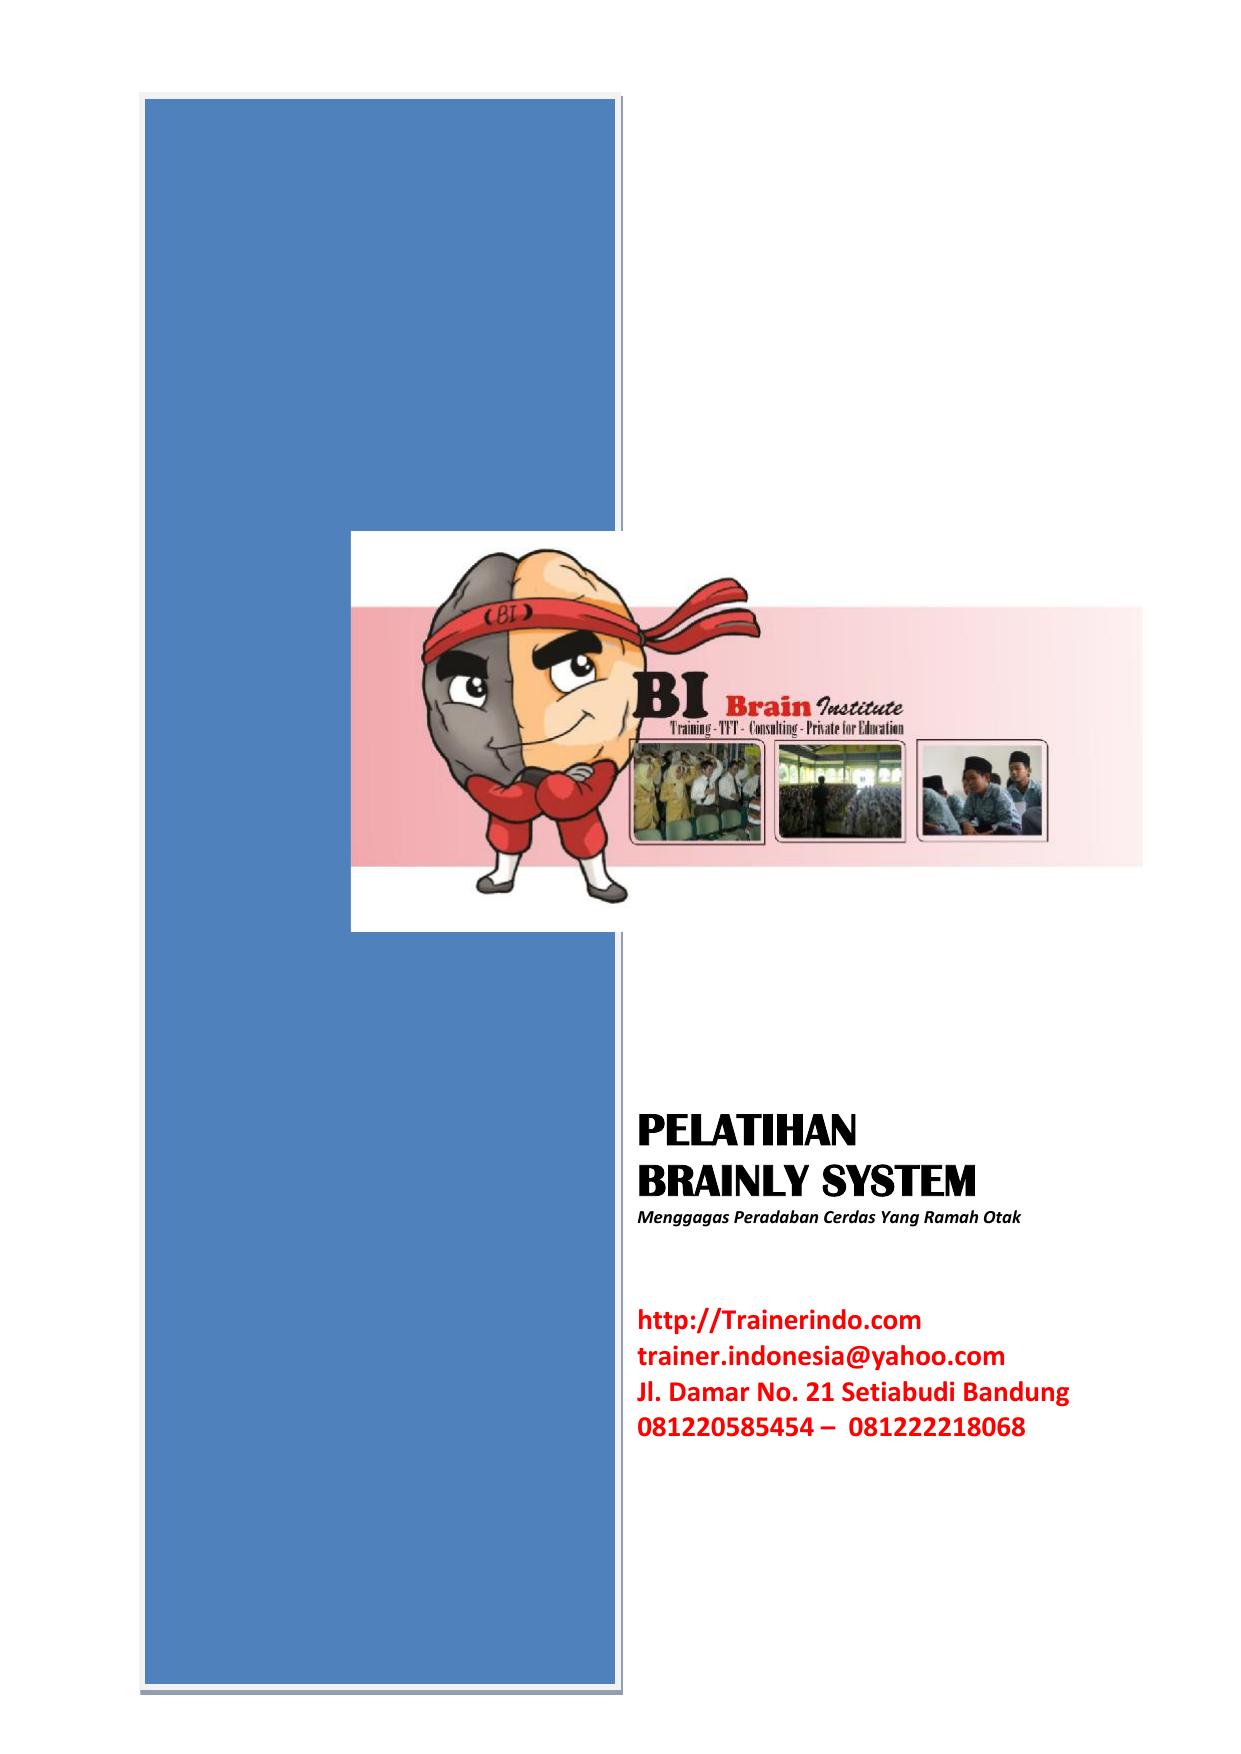 Pelatihan Brainly System